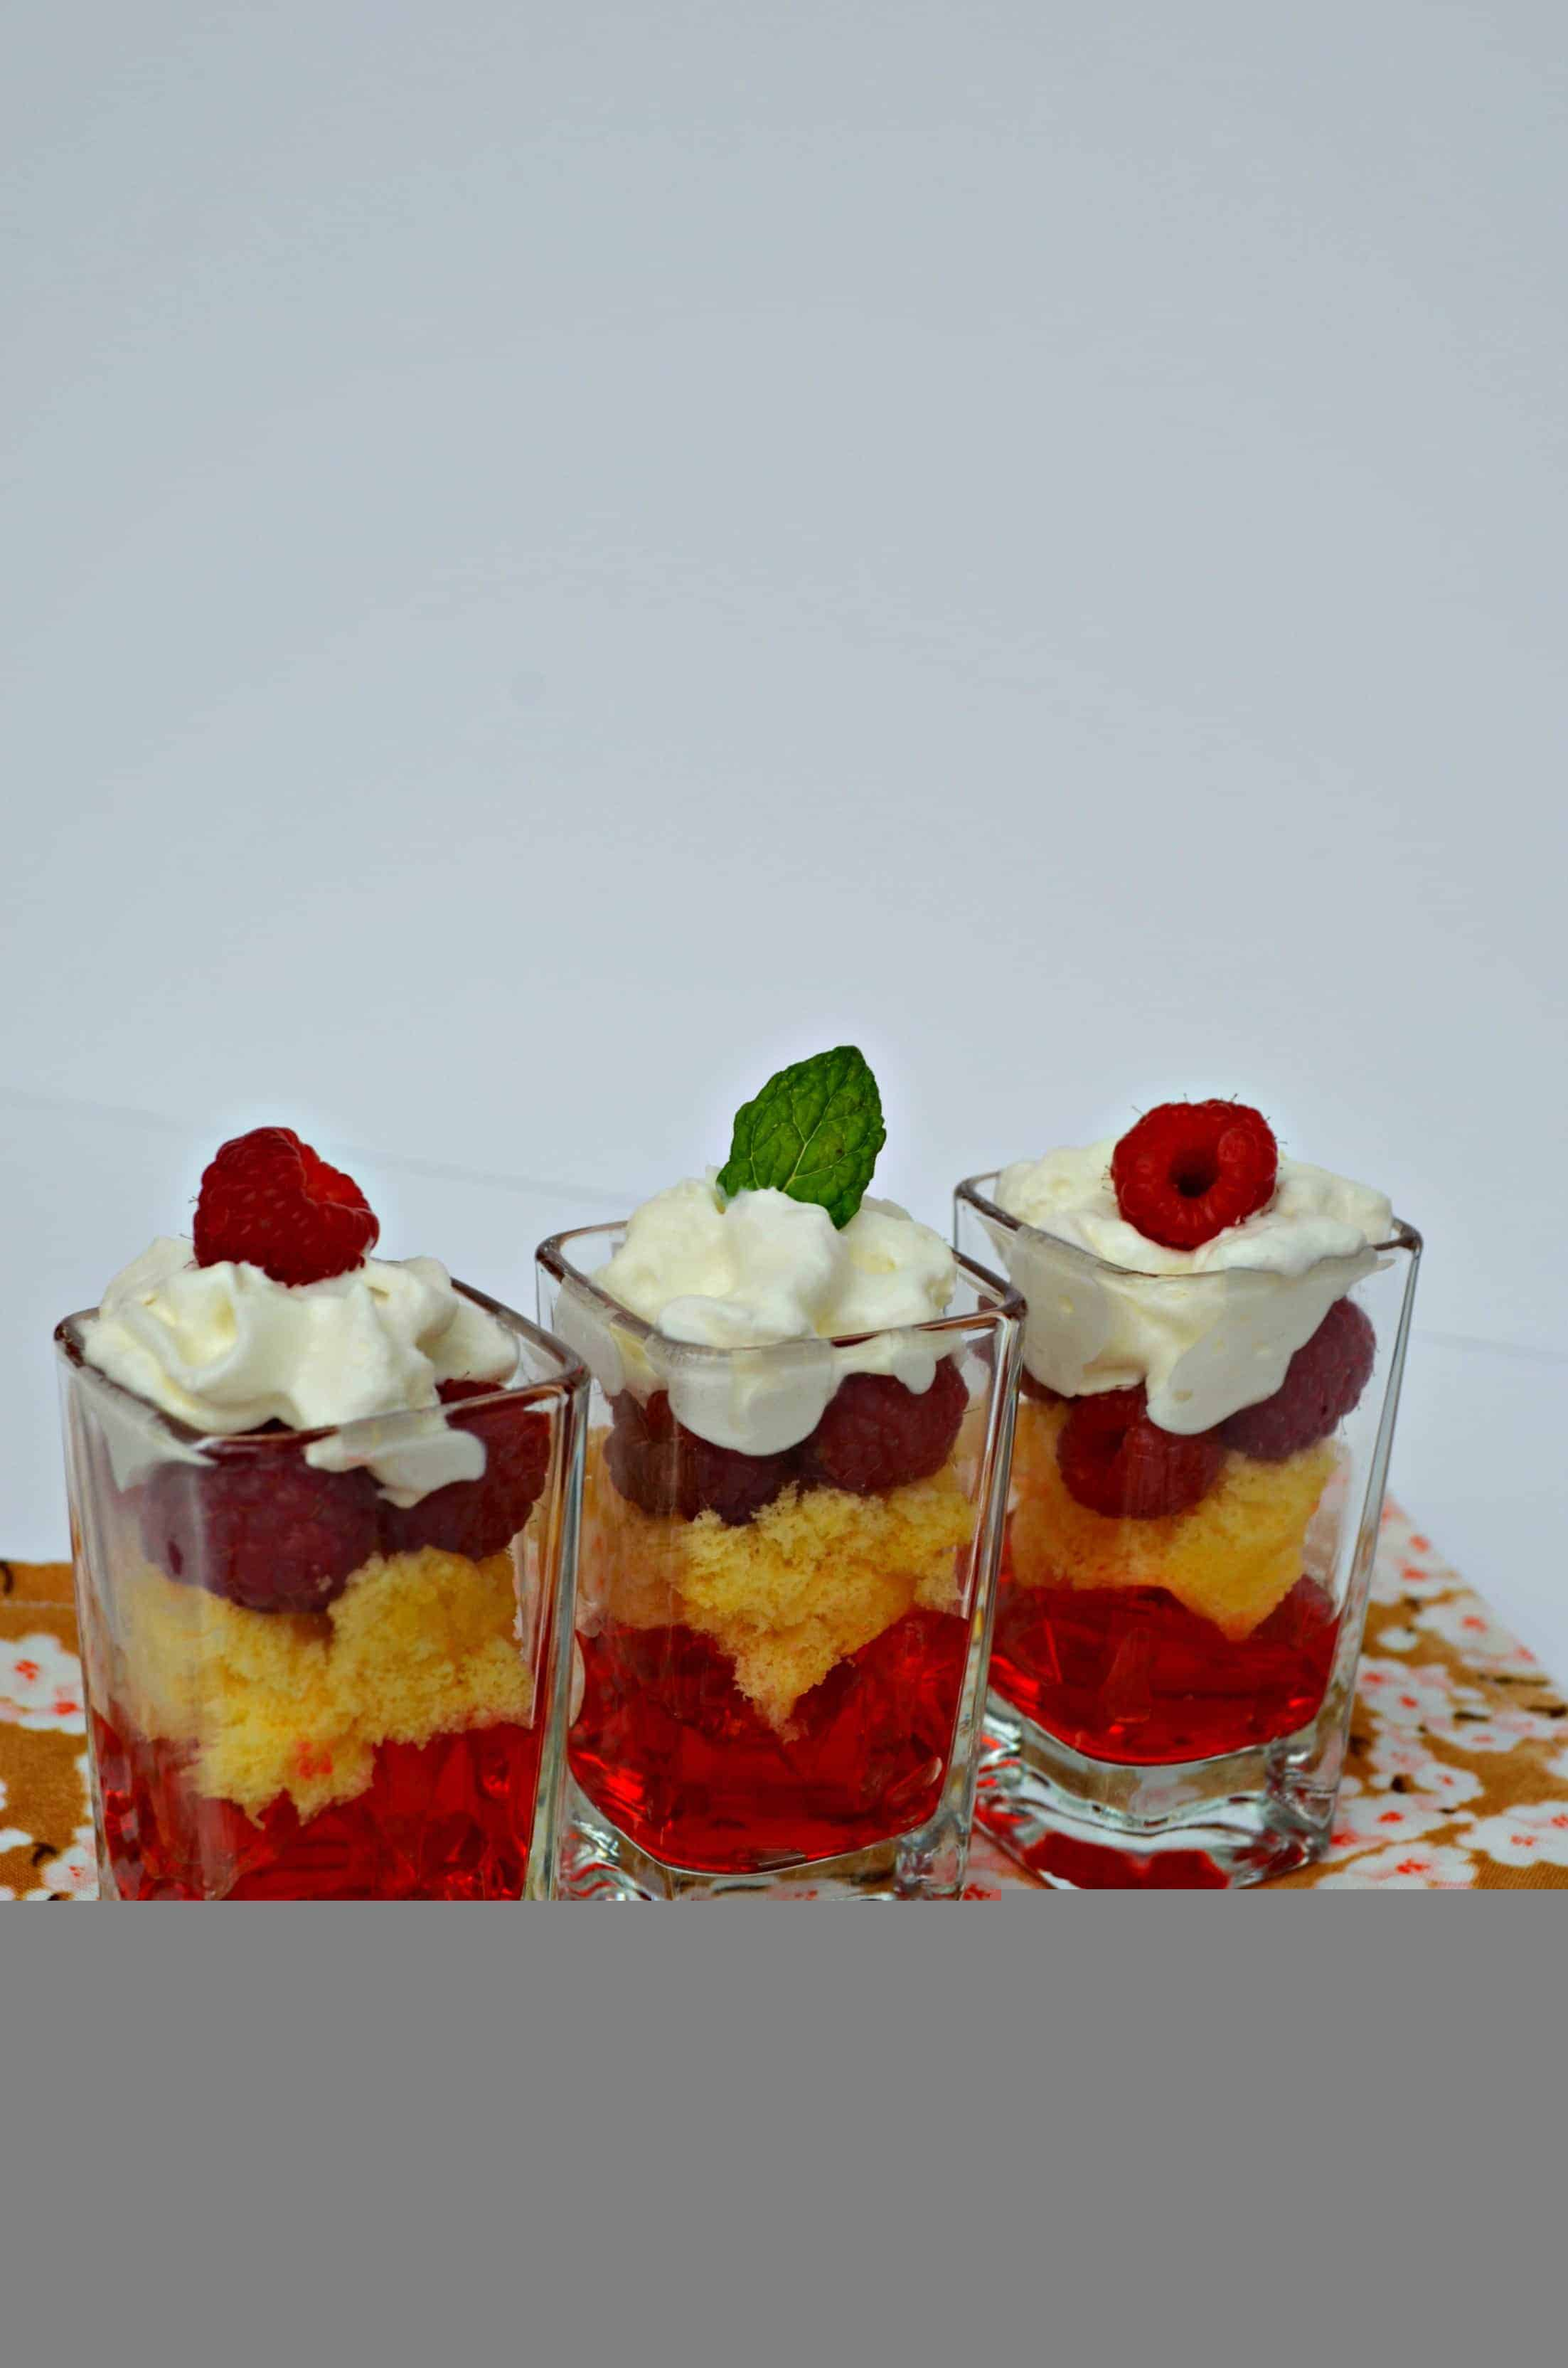 Raspberry Dessert Shooter Recipe for Valentine's Day